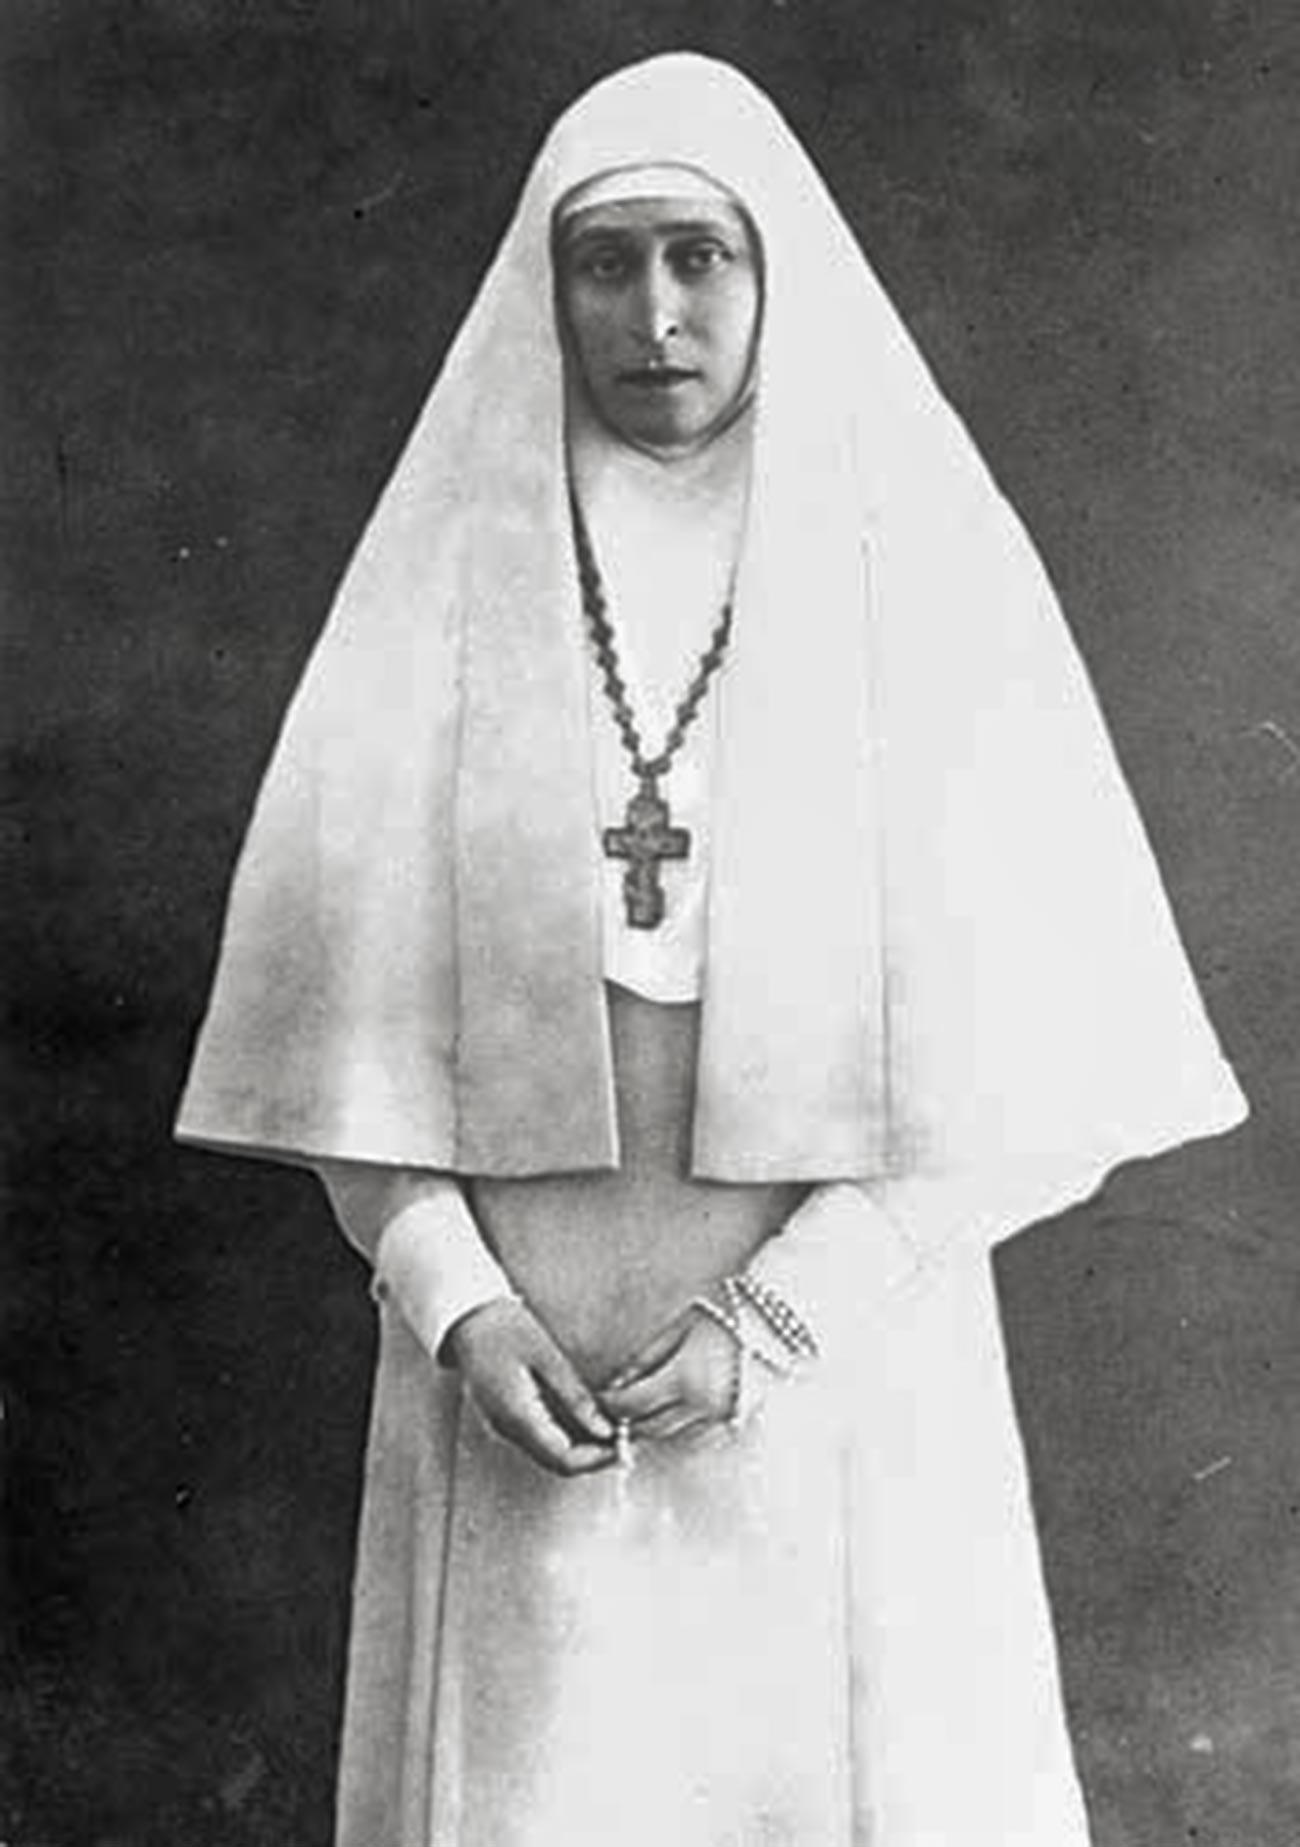 La grande-duchesse Élisabeth en 1918